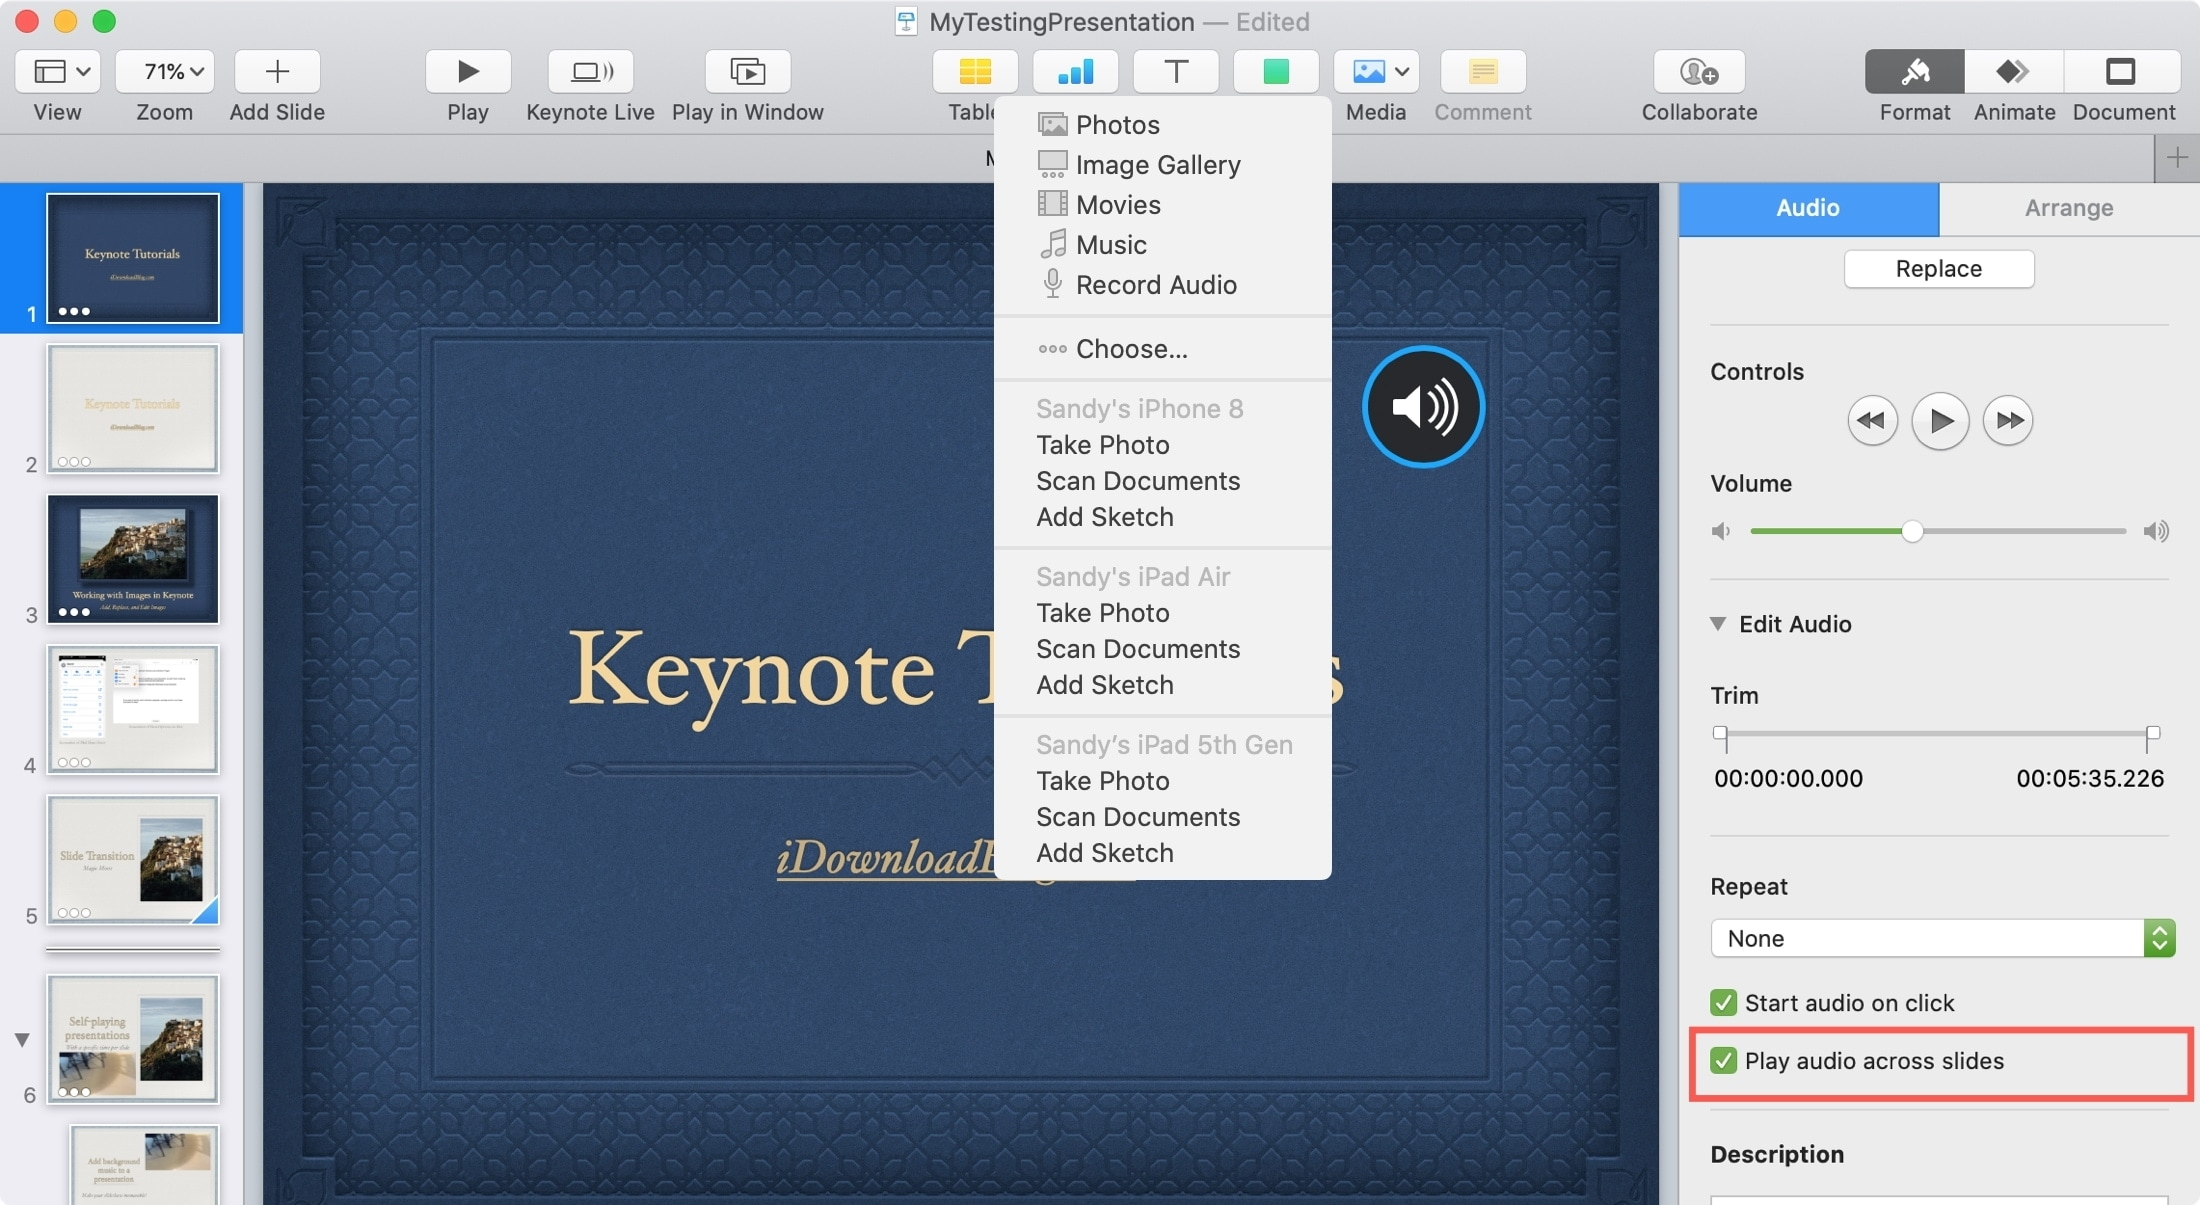 Keynote Mac Insert File and Play Across Slides